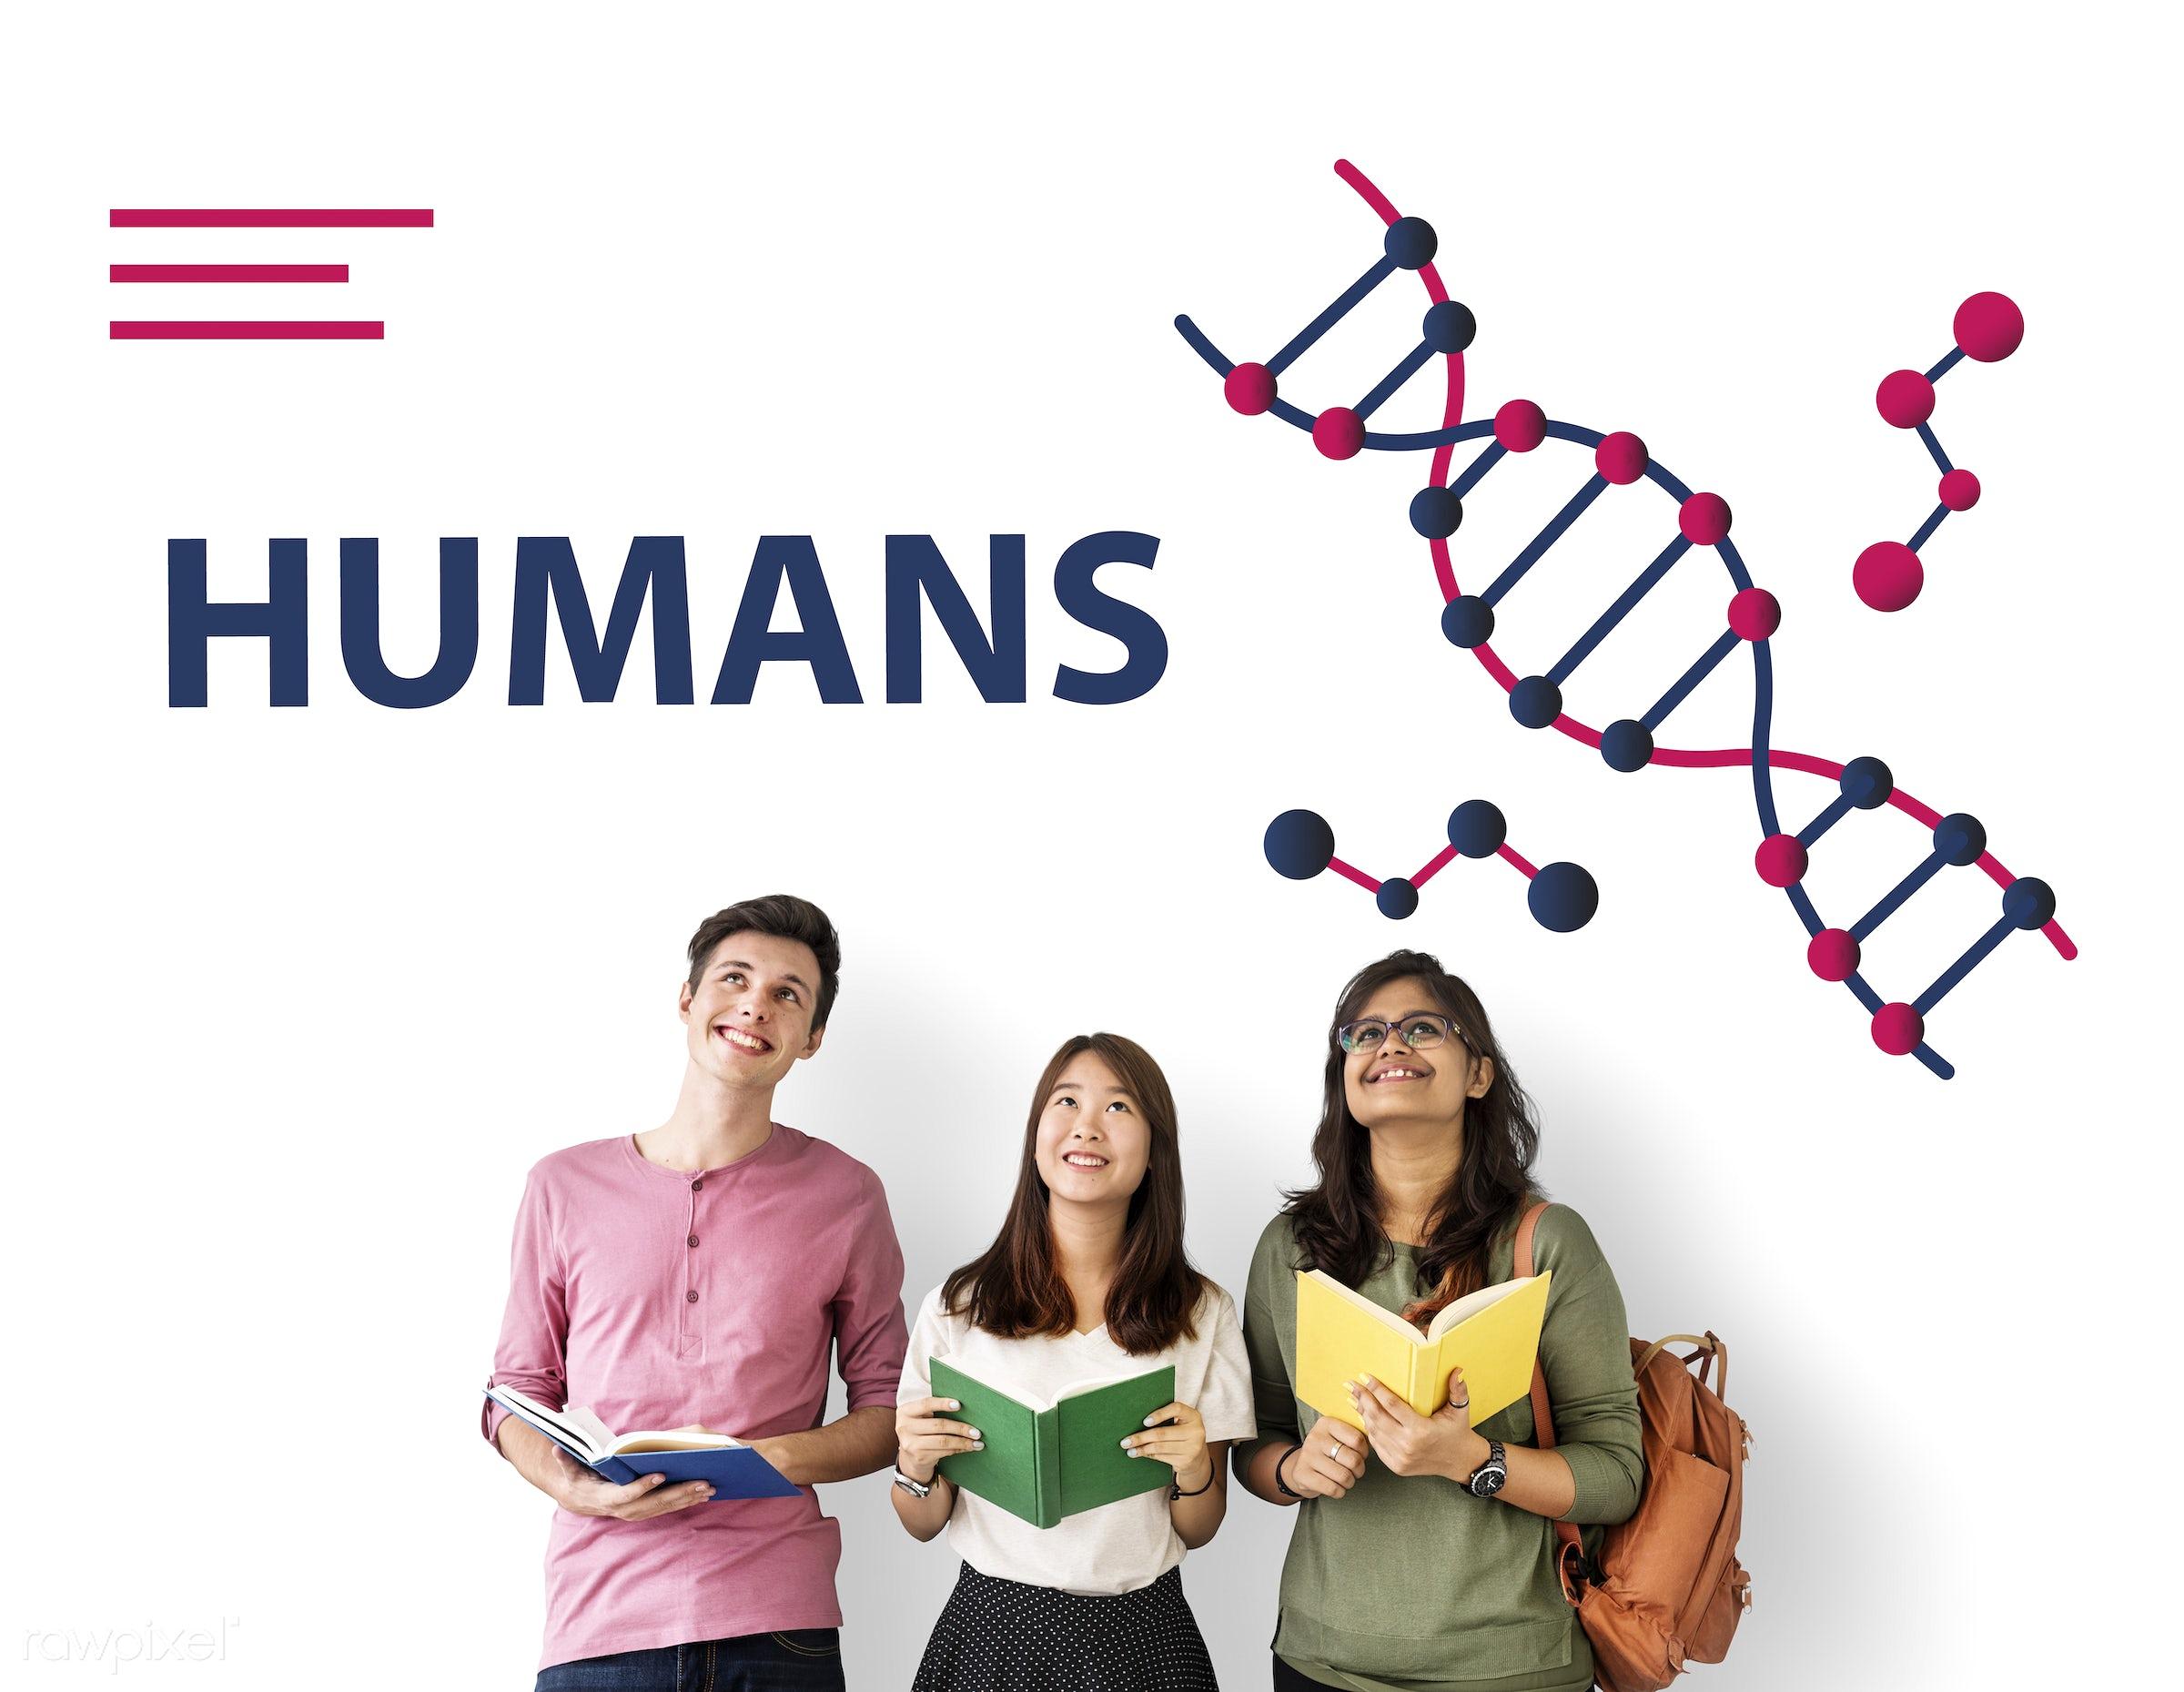 african descent, asian, biochemistry, biotech, book, caucasian, complexity, connection, development, diversity, dna,...